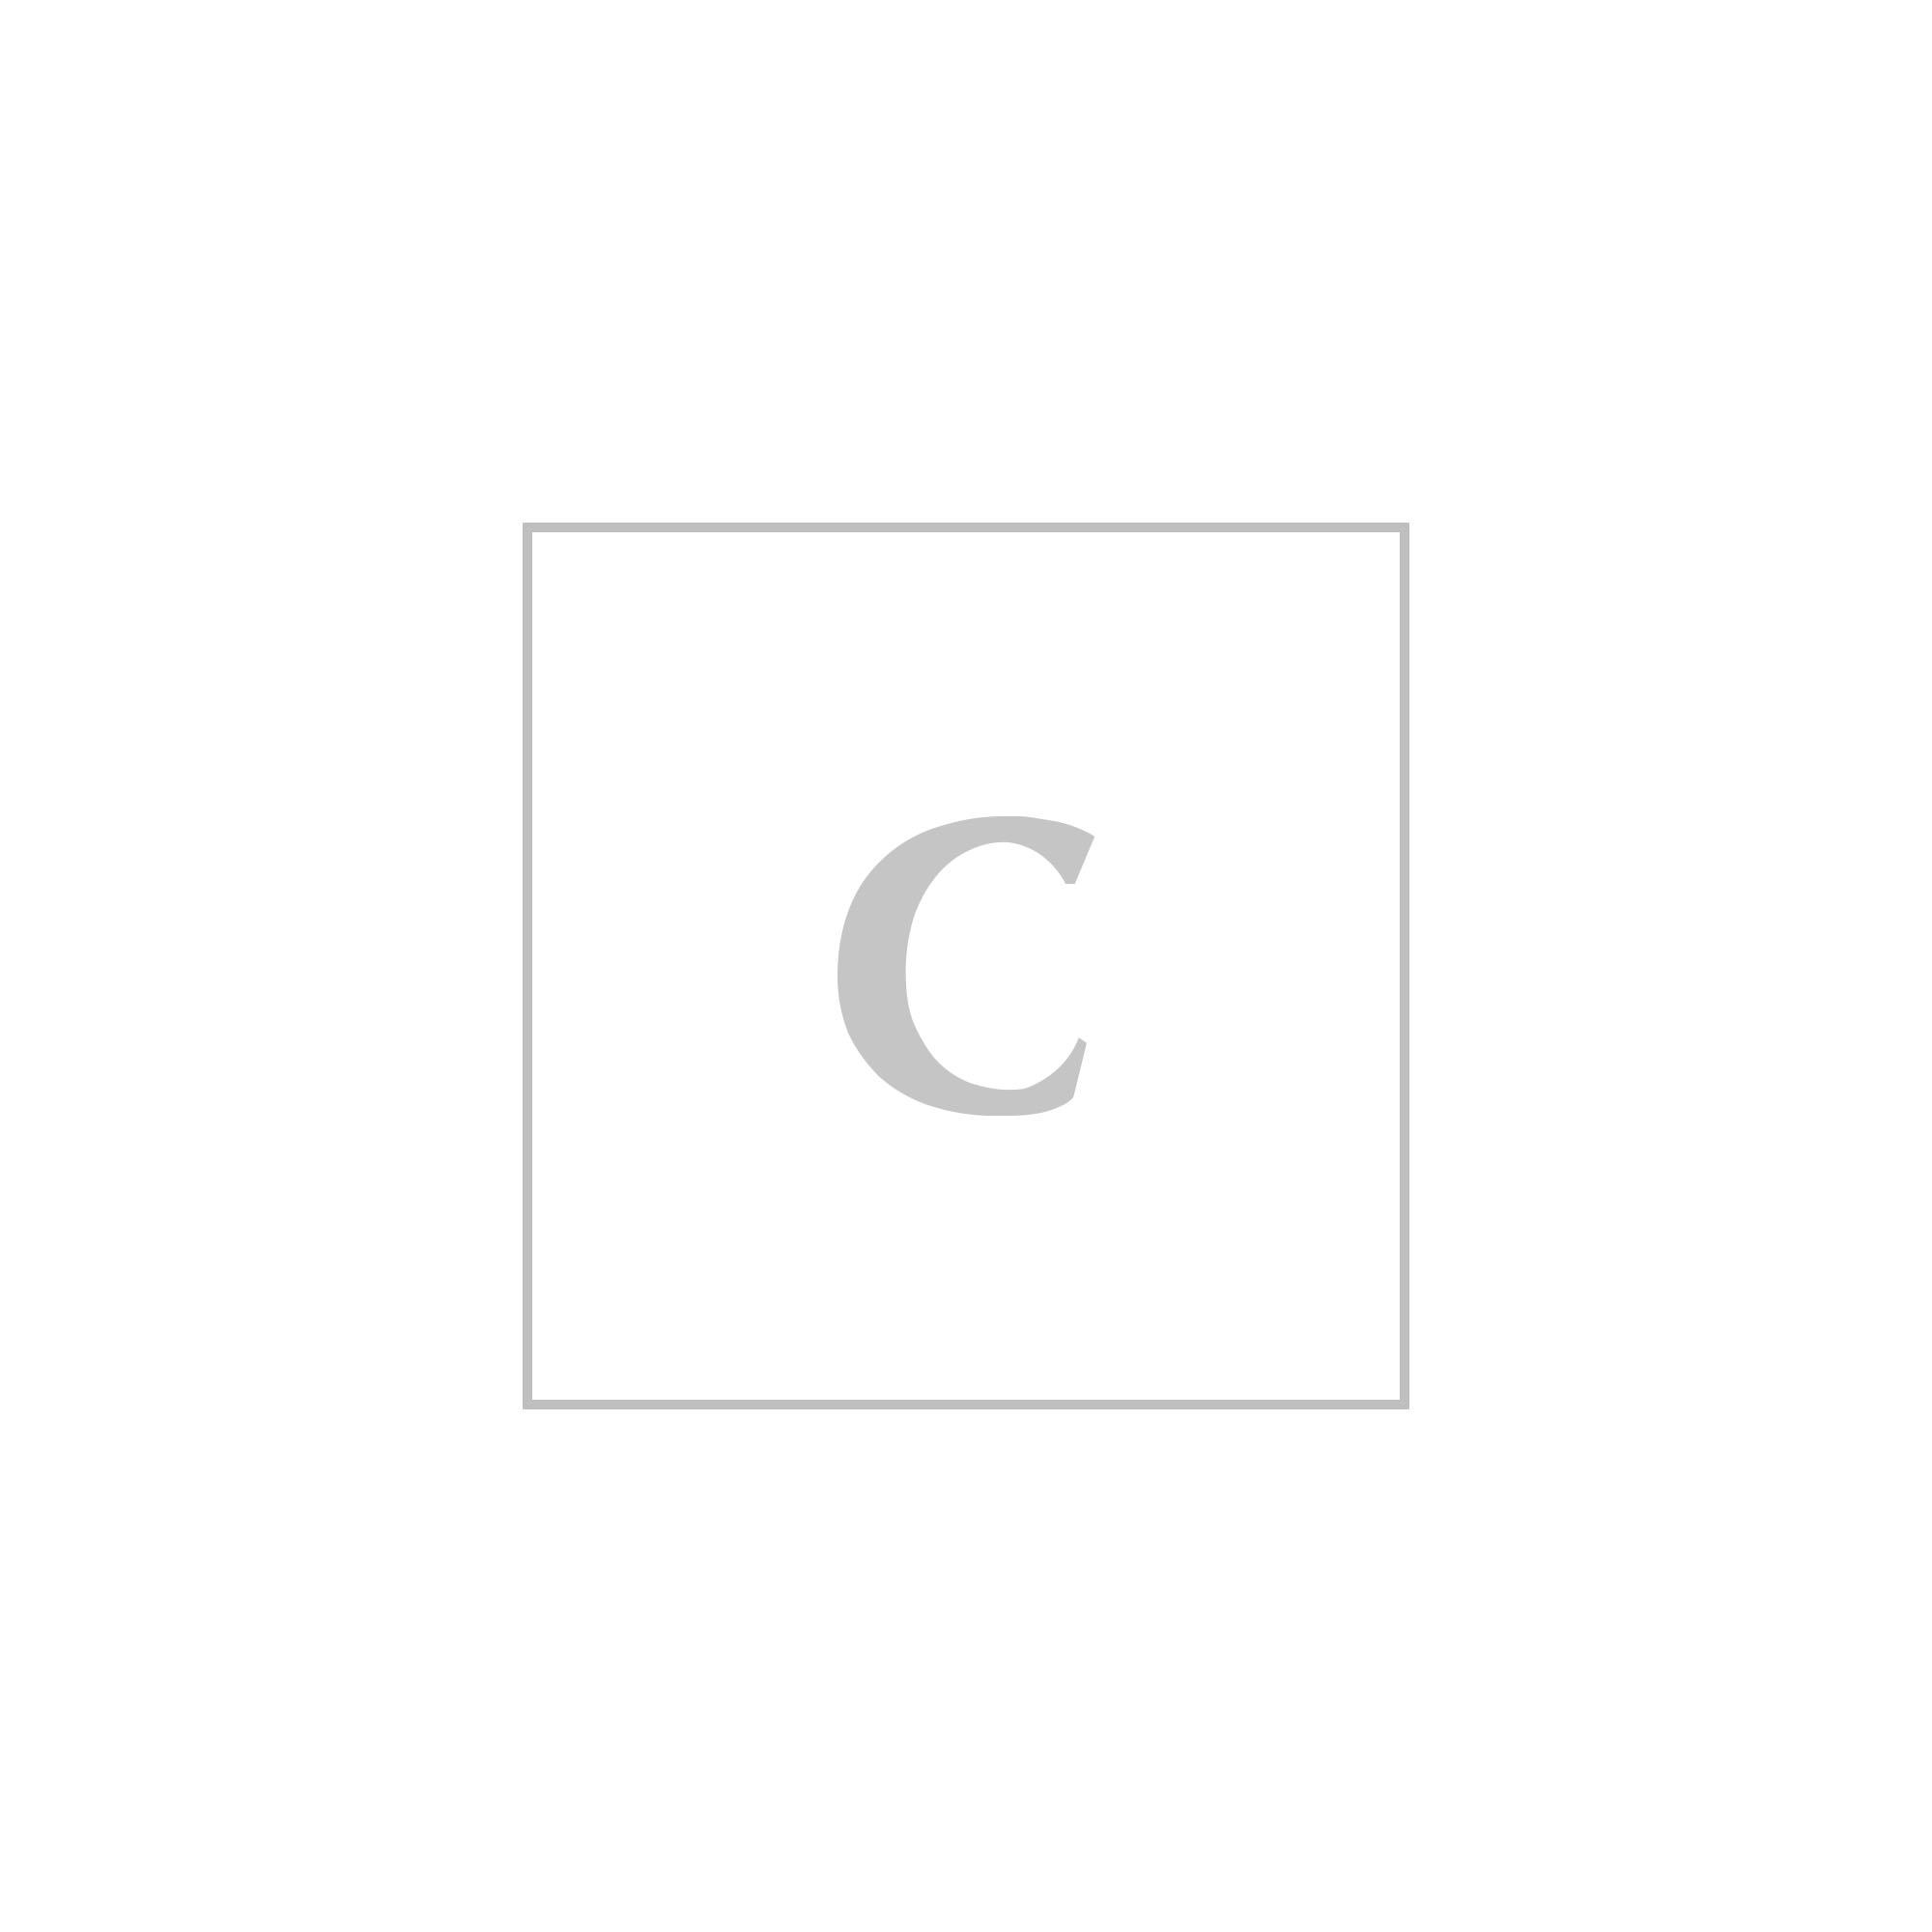 f4307ef76163 Clutches Prada for Women 000006